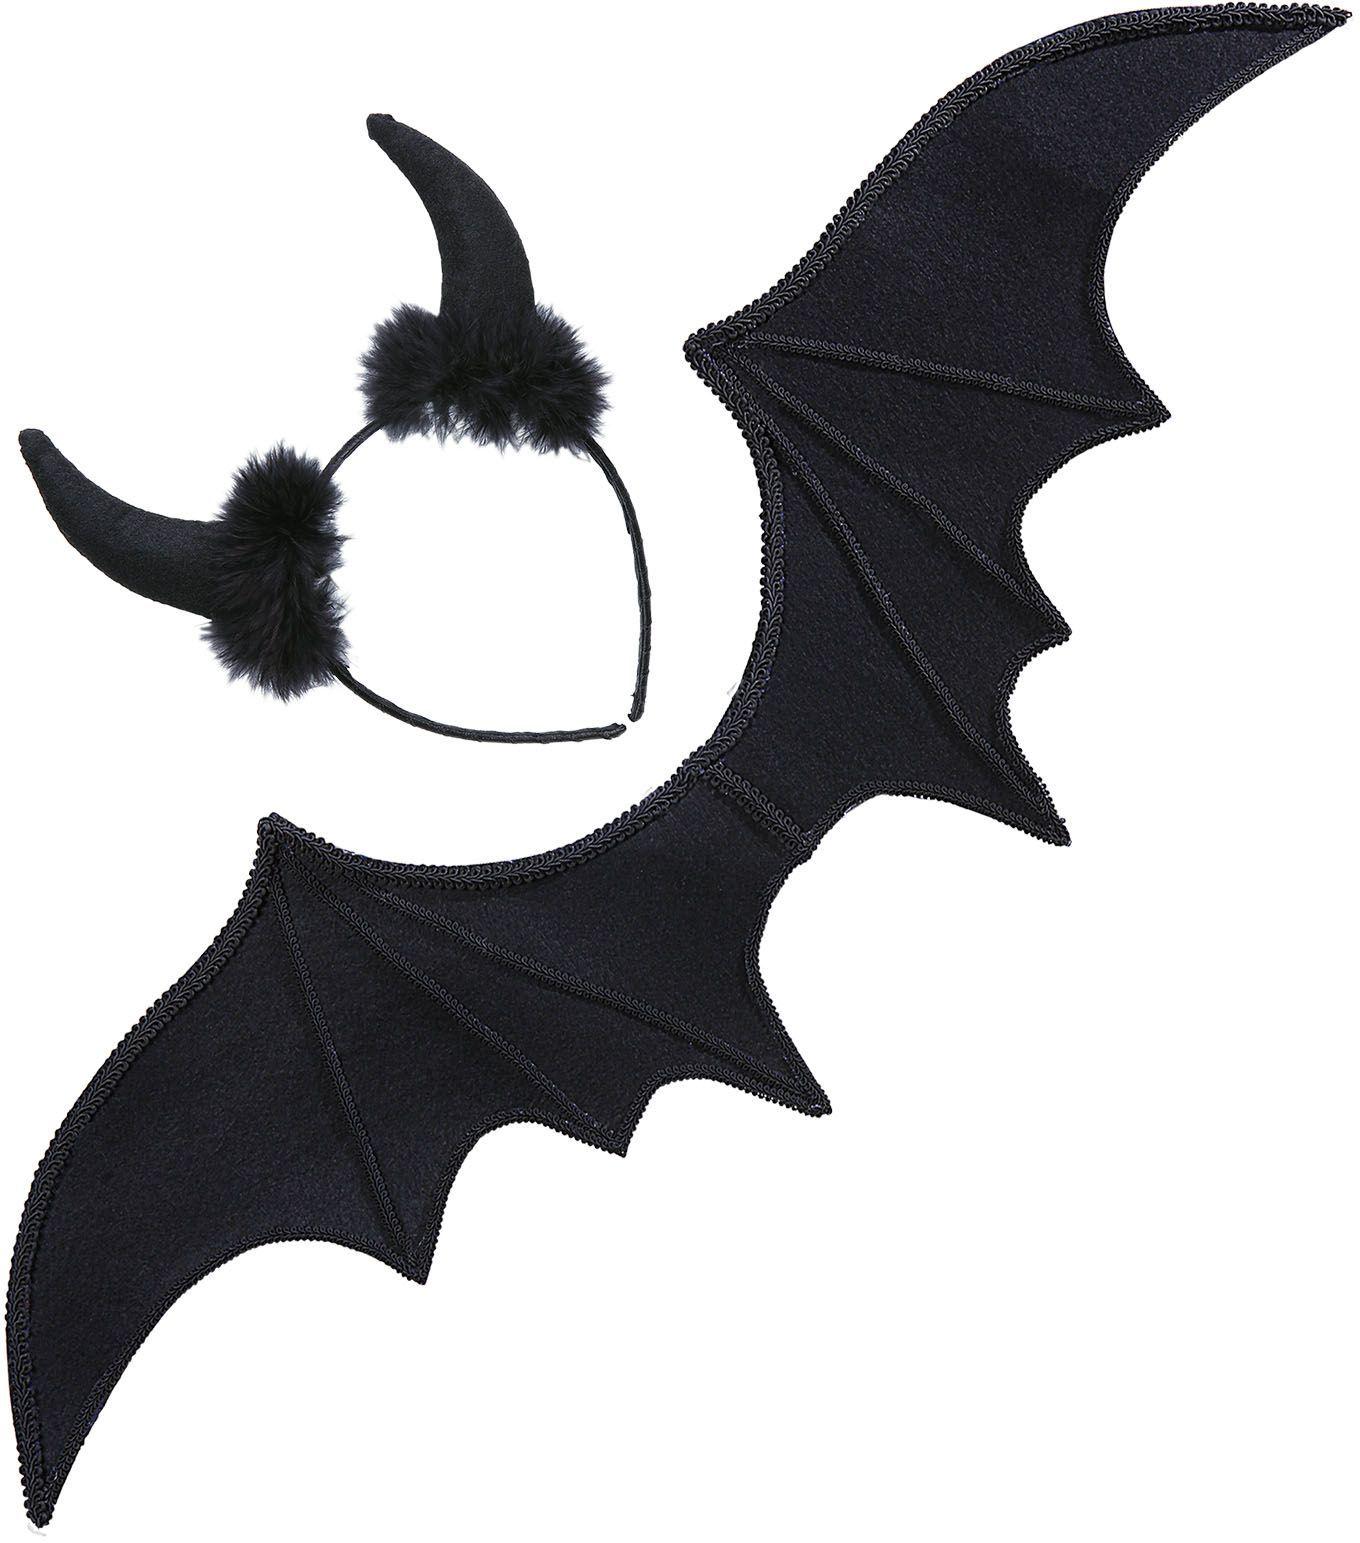 Duivel vleugels met oren